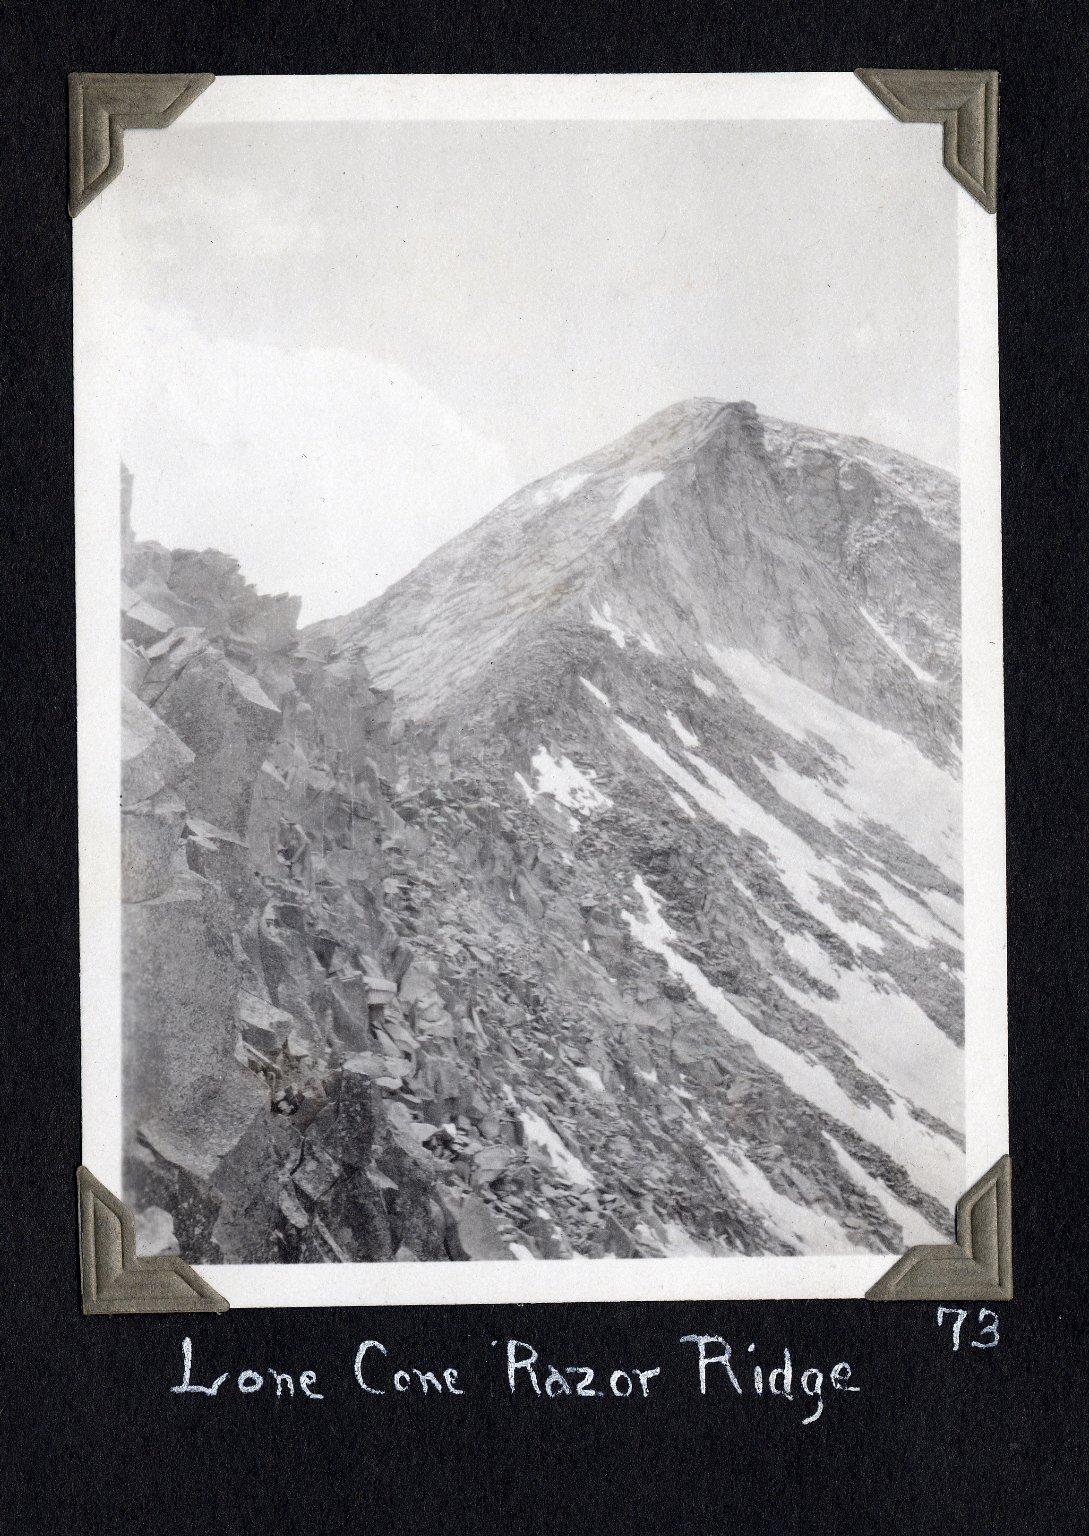 Lone Cone Razor Ridge